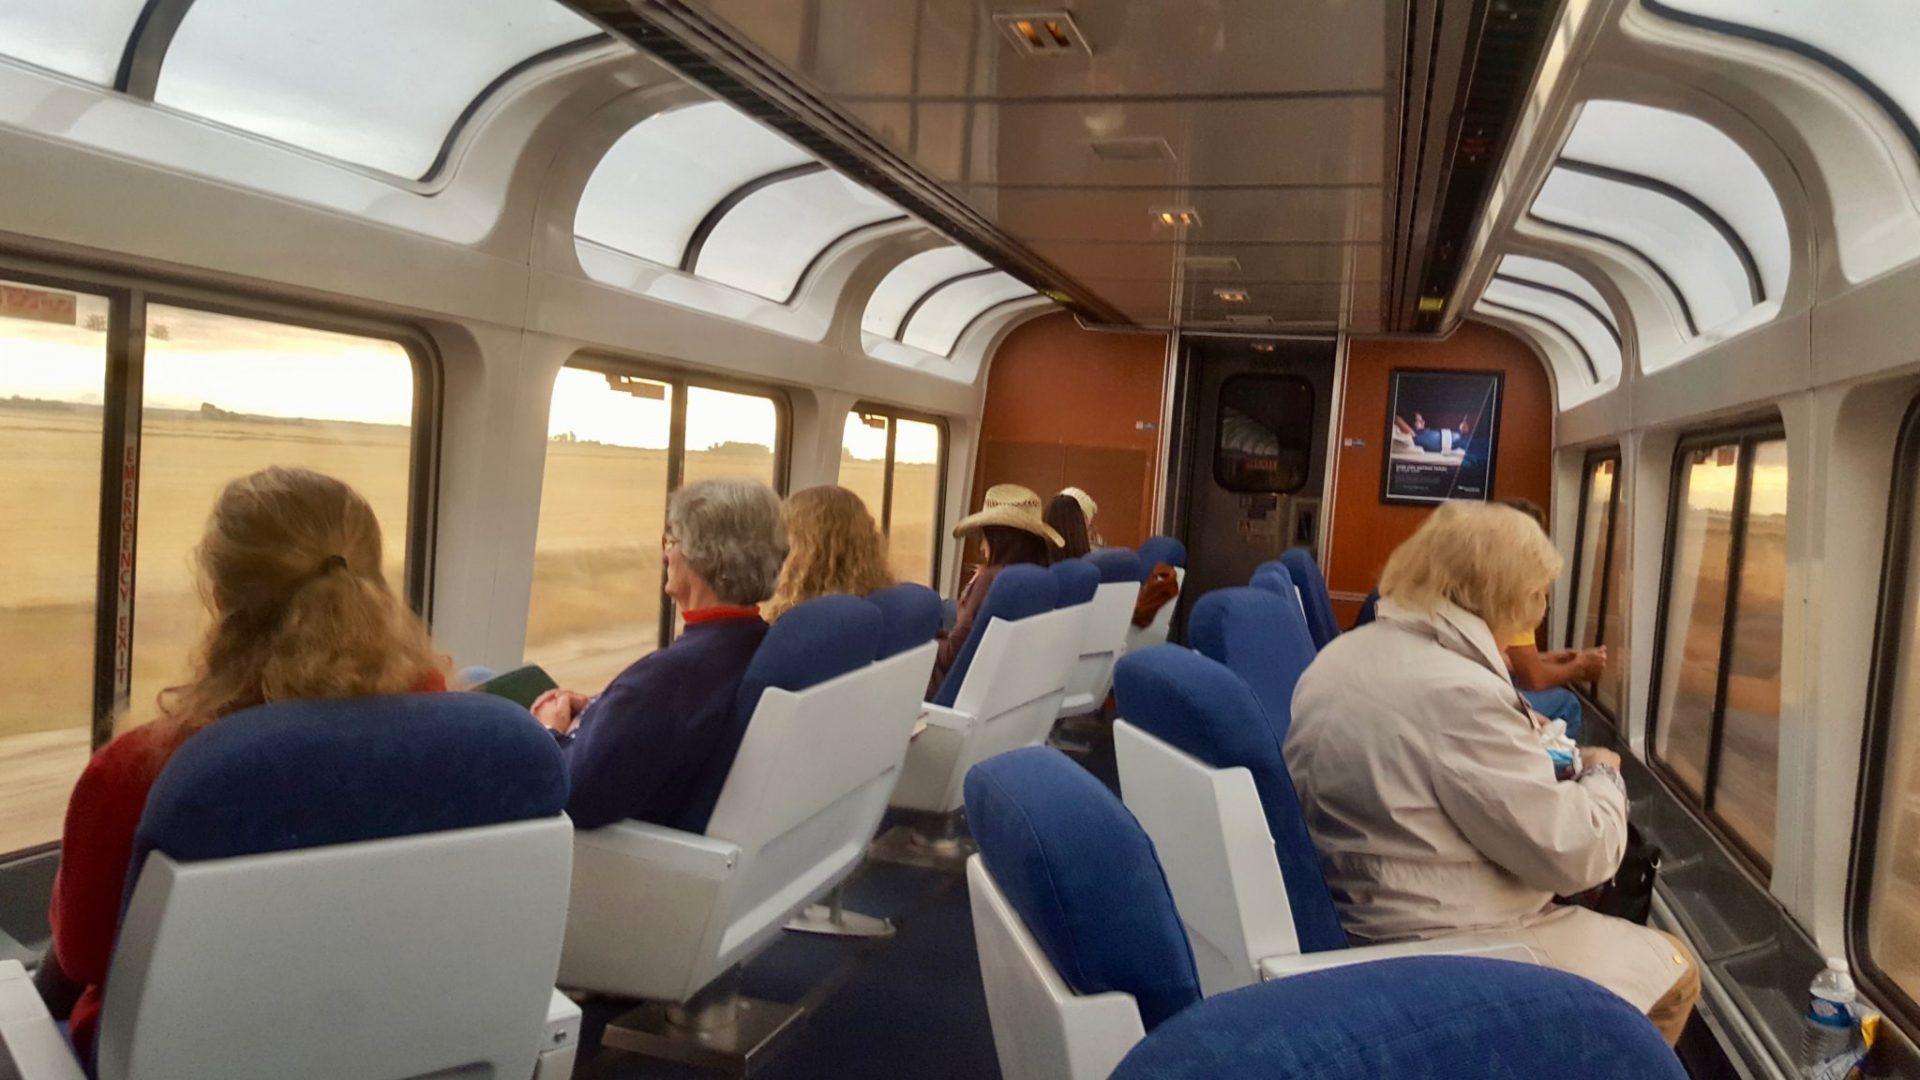 Amtrak Empire Builder Review + Travel Tips for Rail Trip